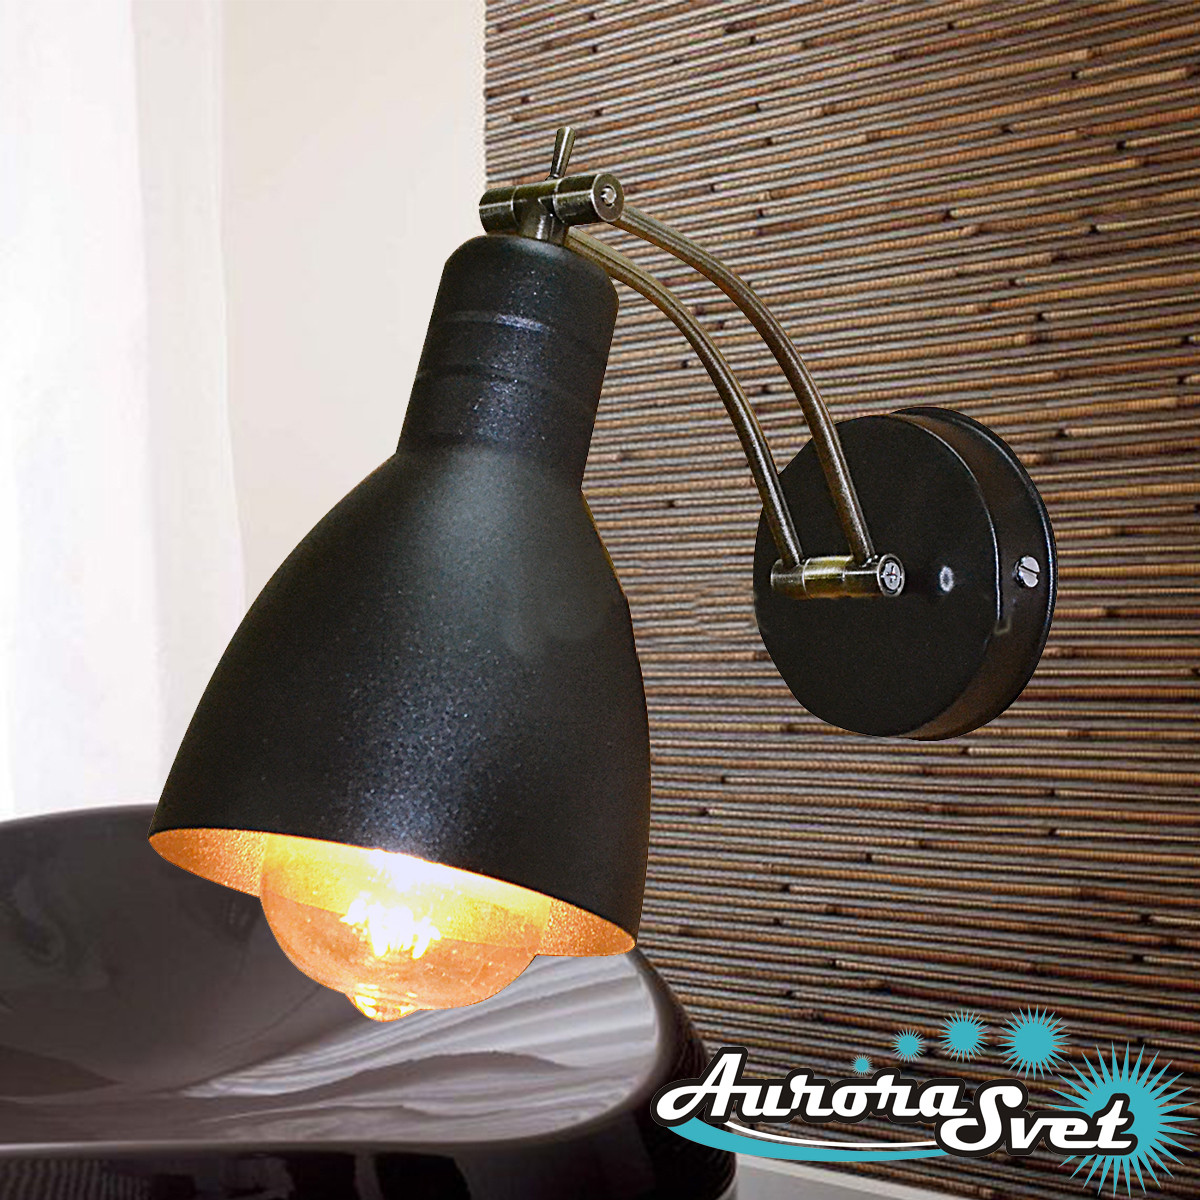 Бра настенная AuroraSvet loft 9700 чёрная.LED светильник бра. Светодиодный светильник бра.